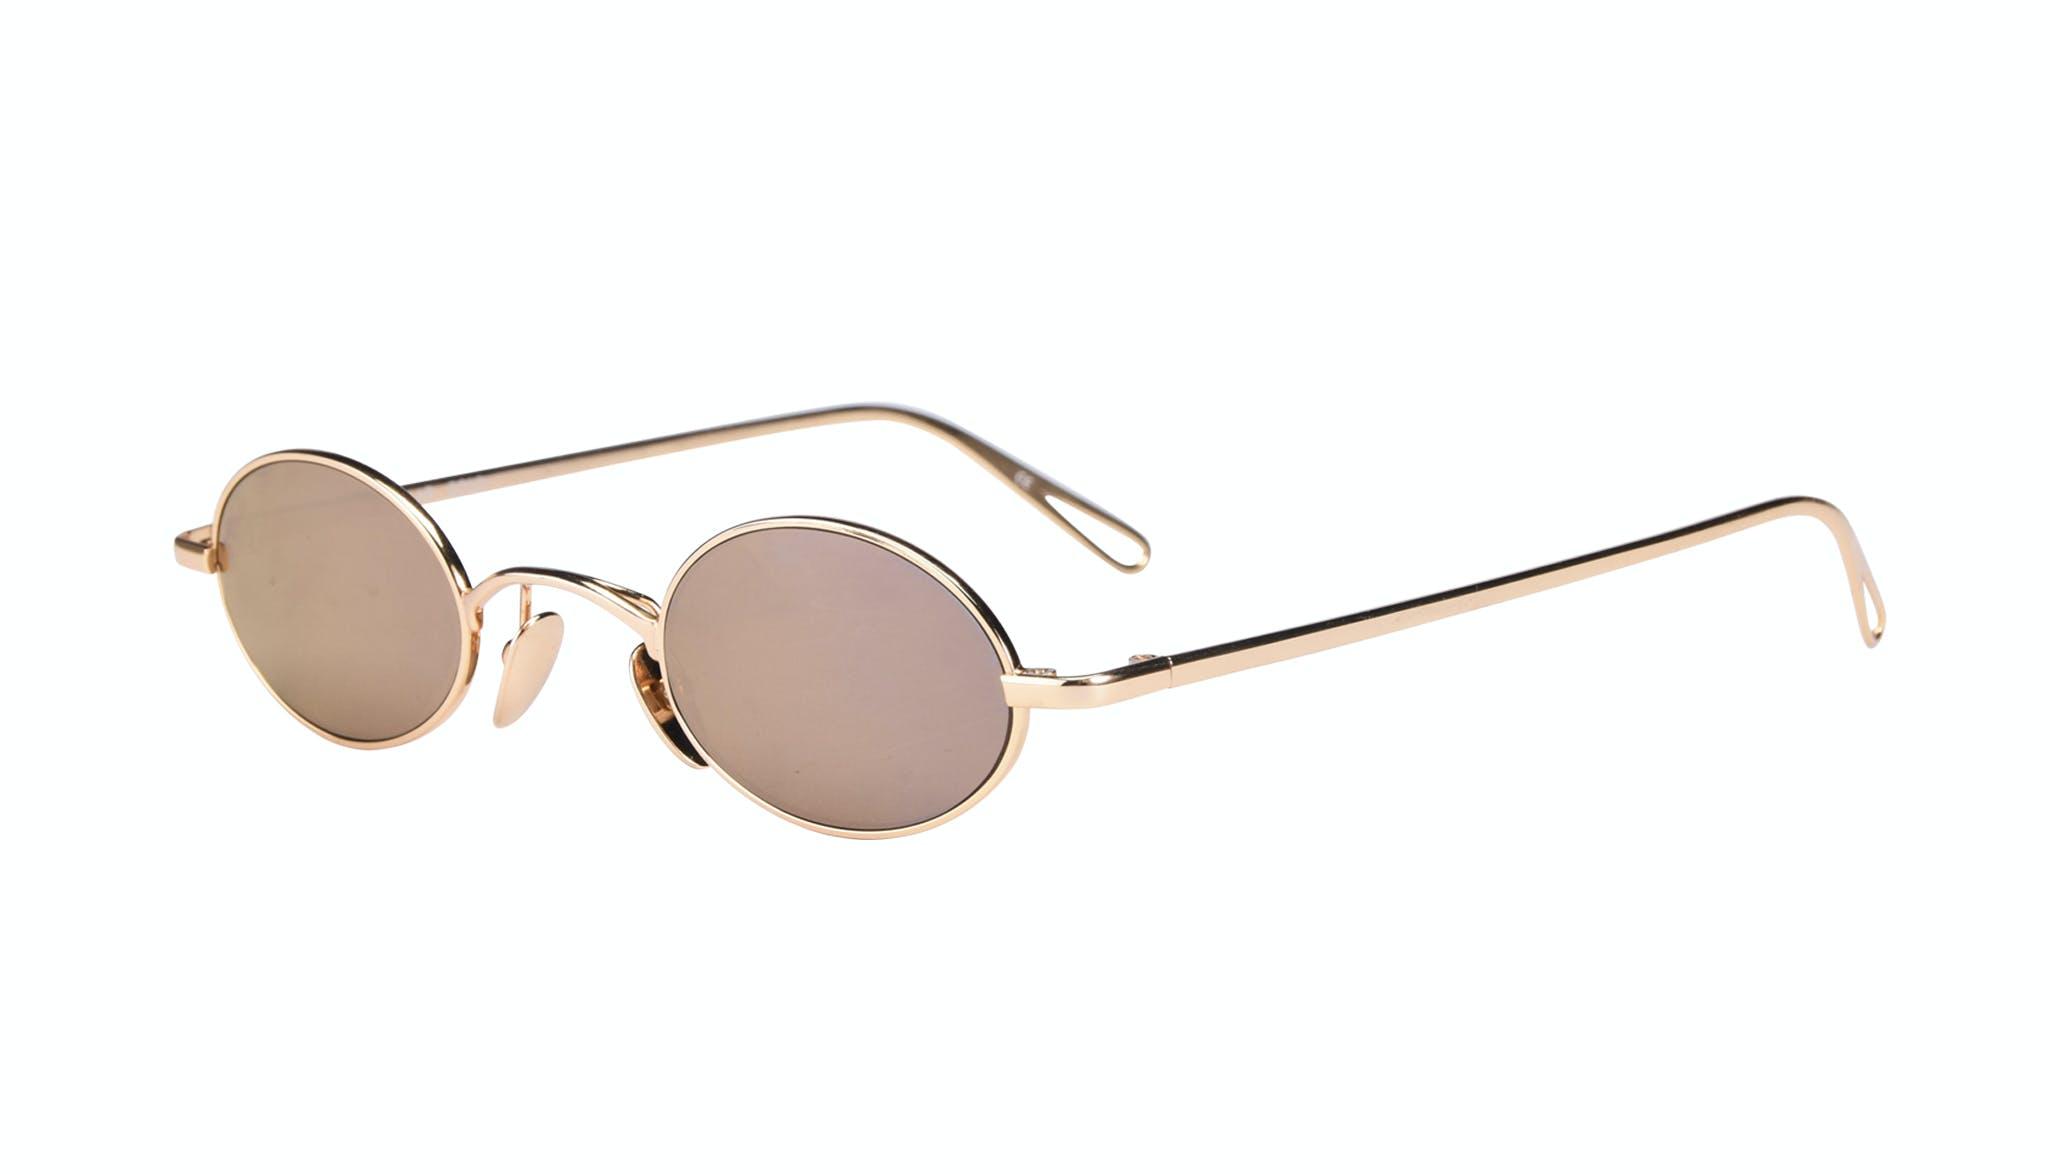 Affordable Fashion Glasses Round Sunglasses Women Stellar Gold Tilt